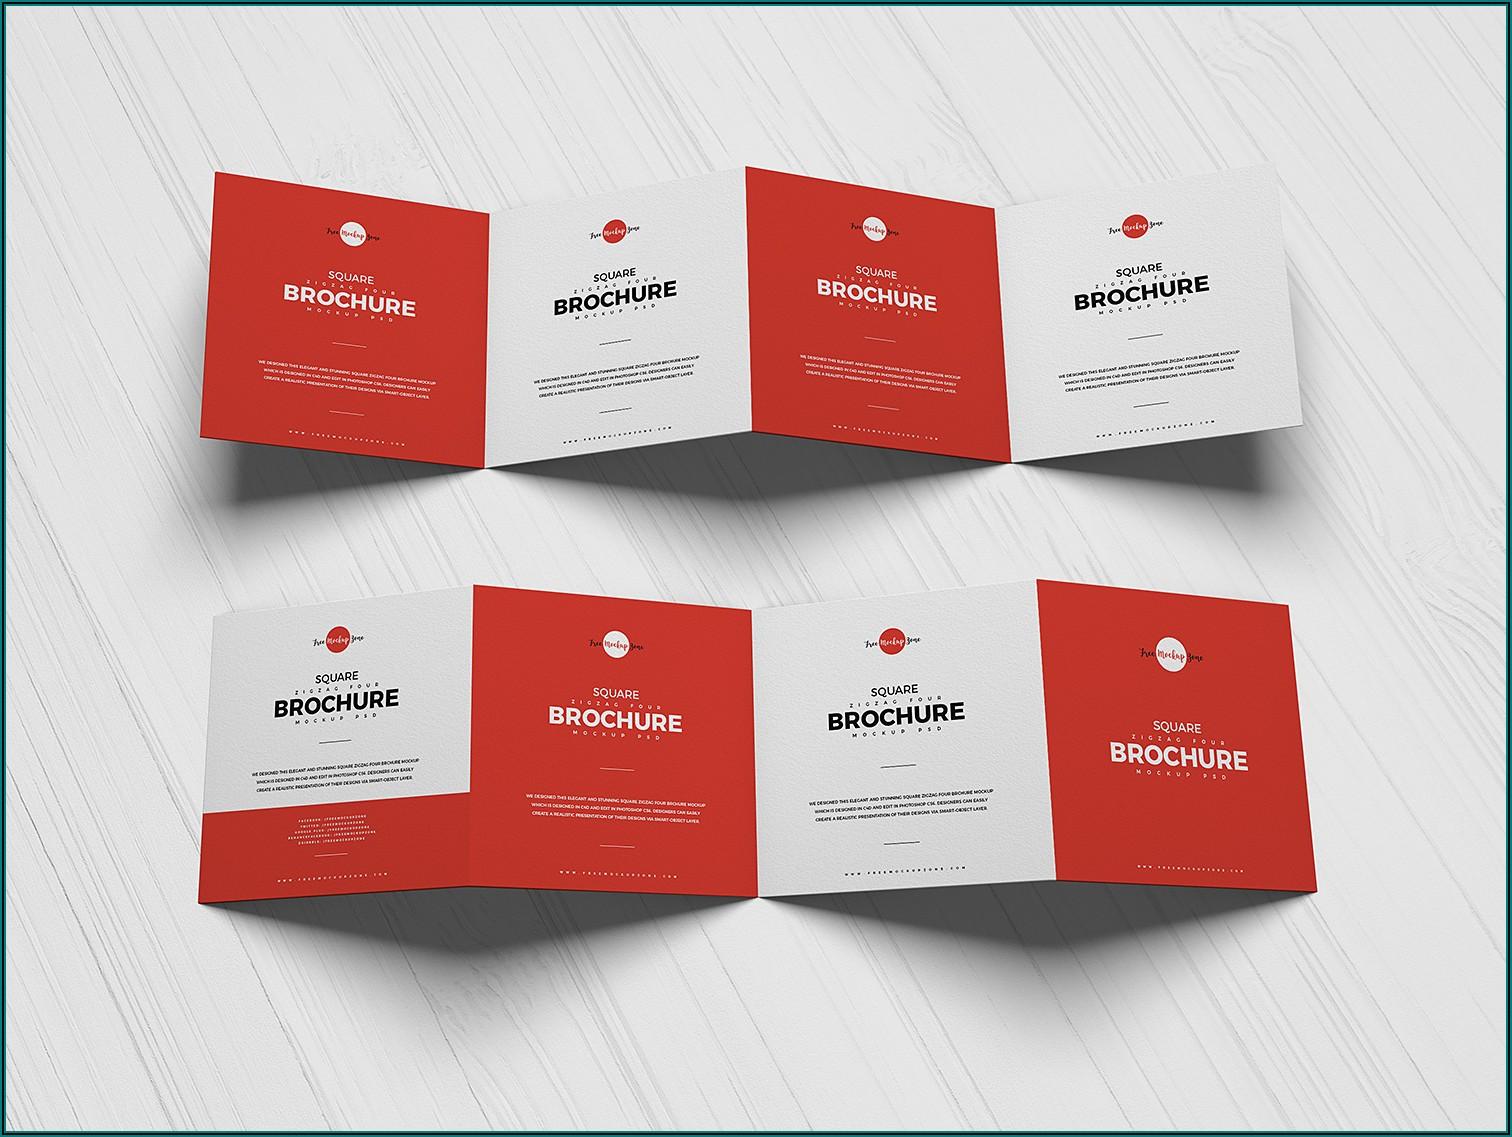 4 Fold Brochure Mockup Free